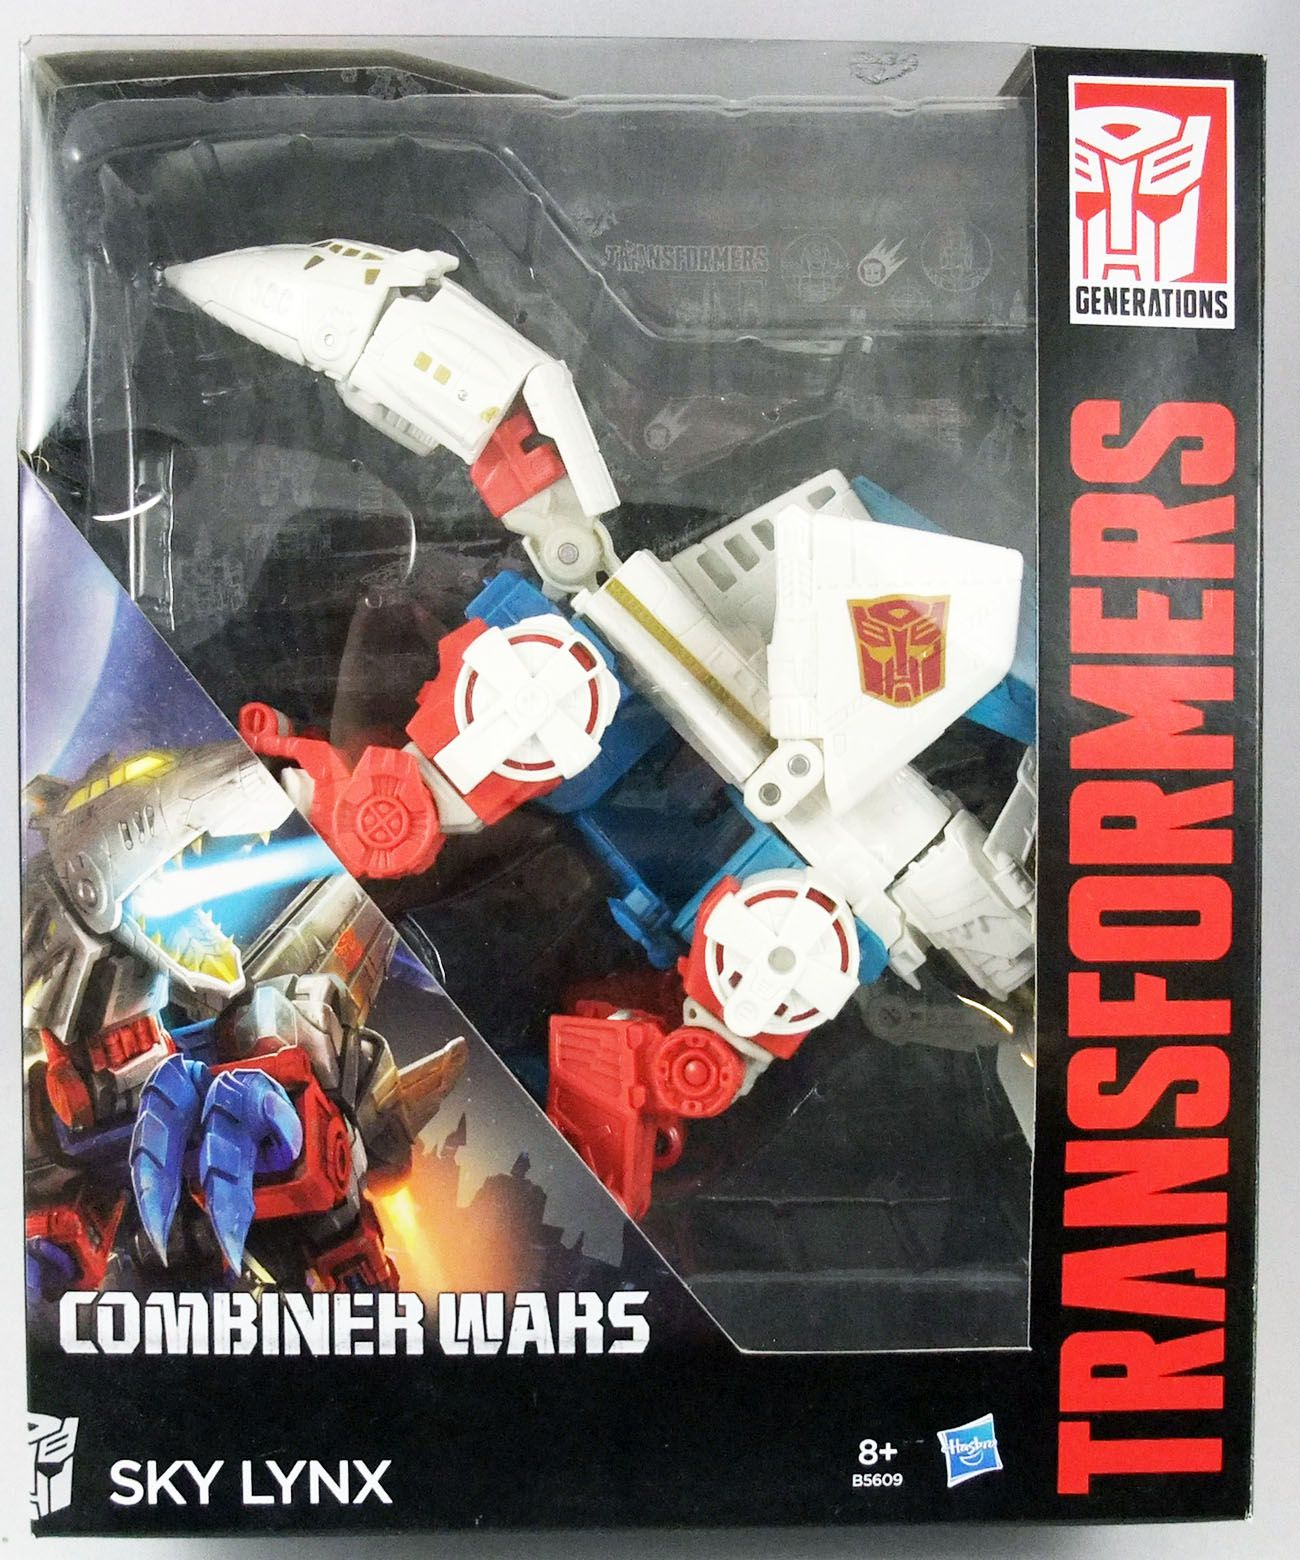 Transformers Generations - Combiner Wars Sky Lynx